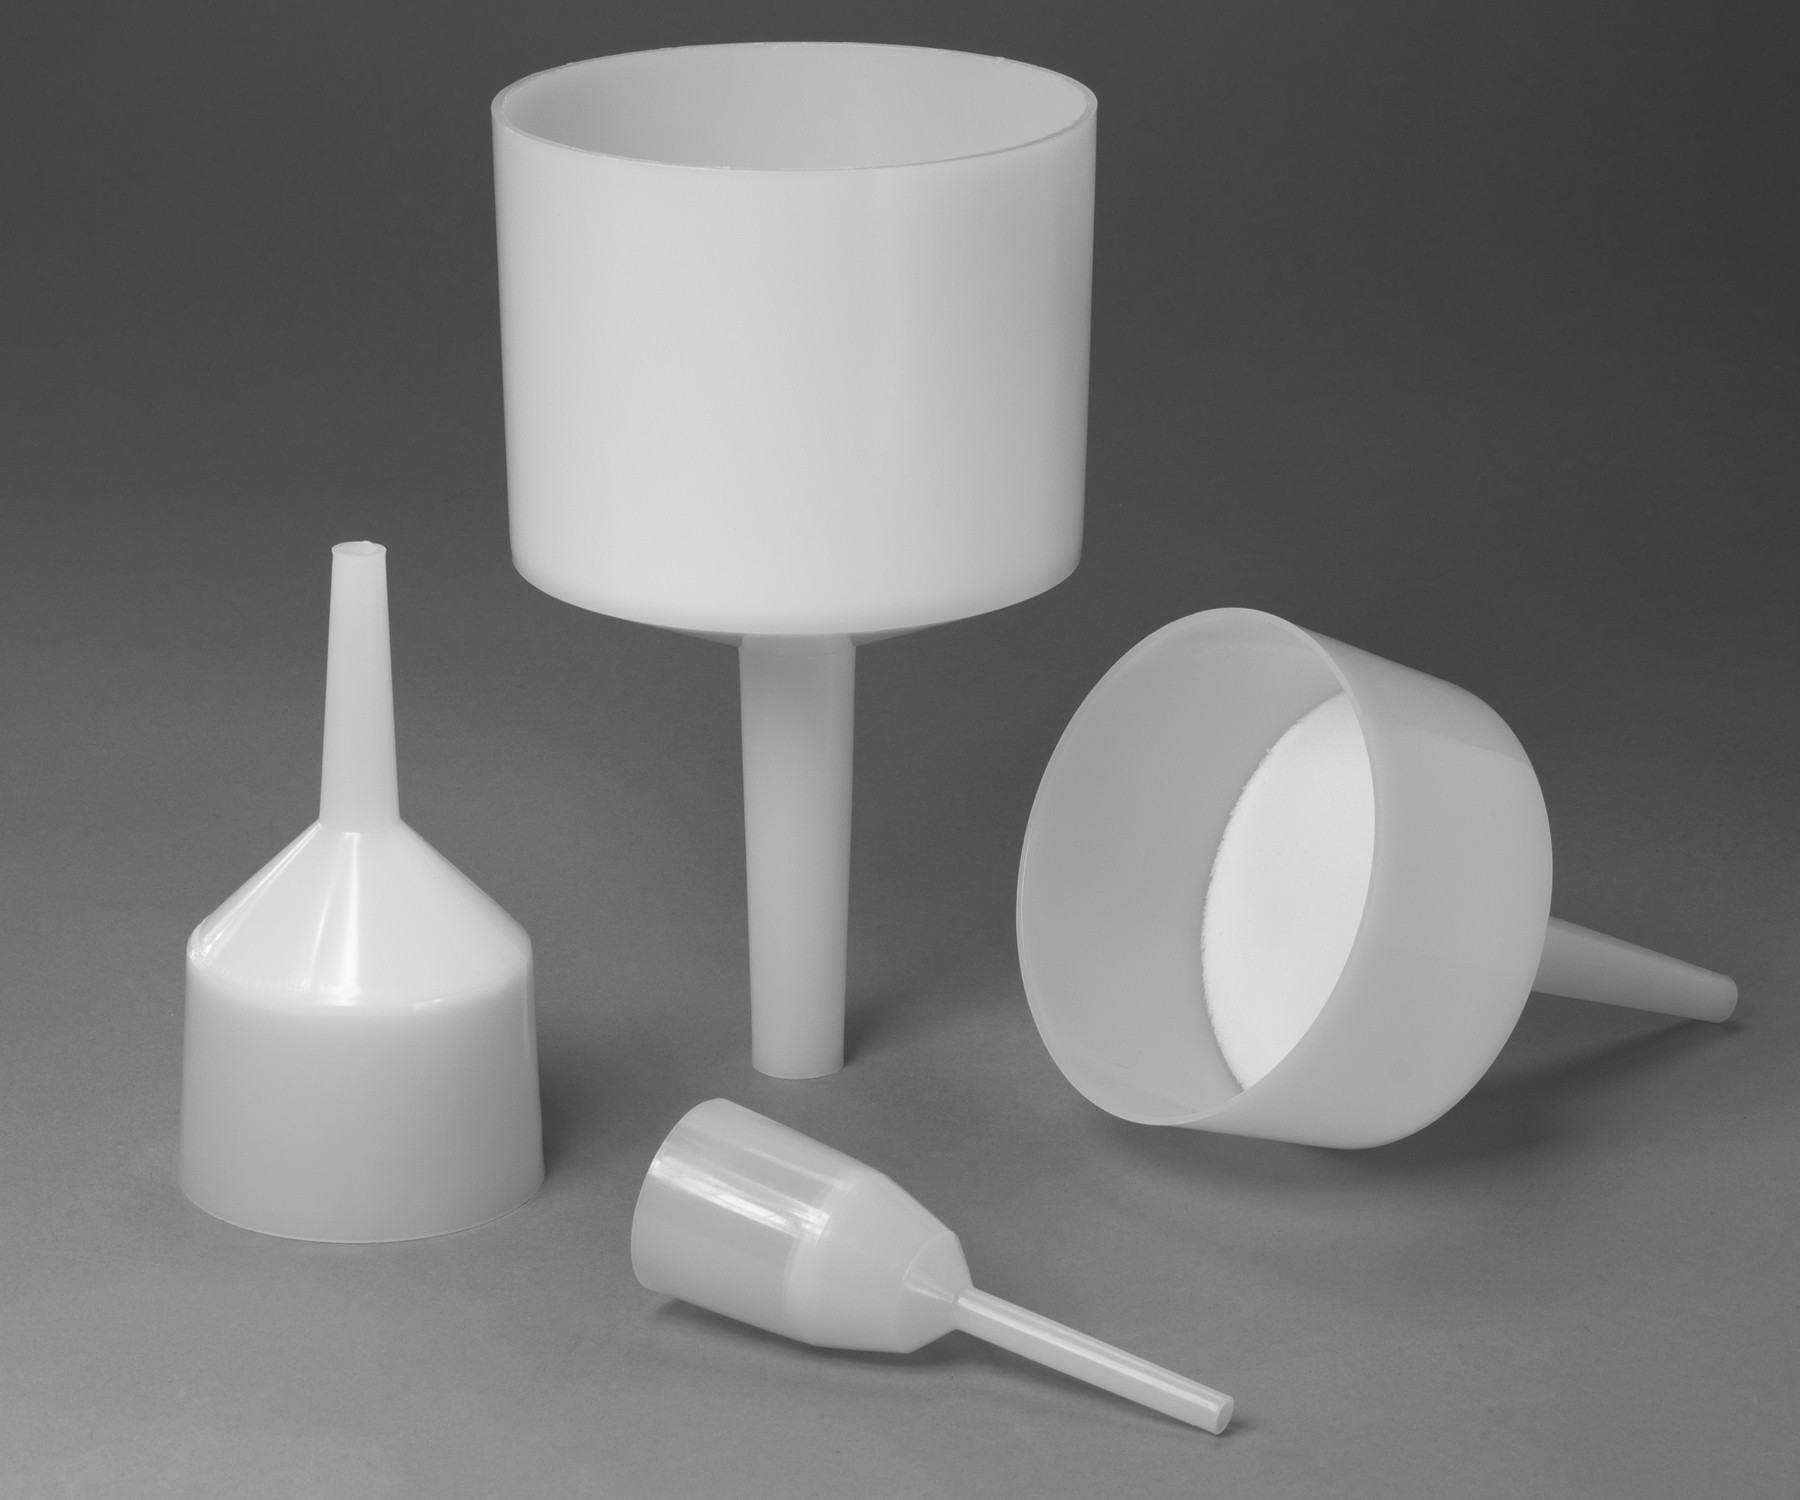 Buchner Funnels – Single Piece